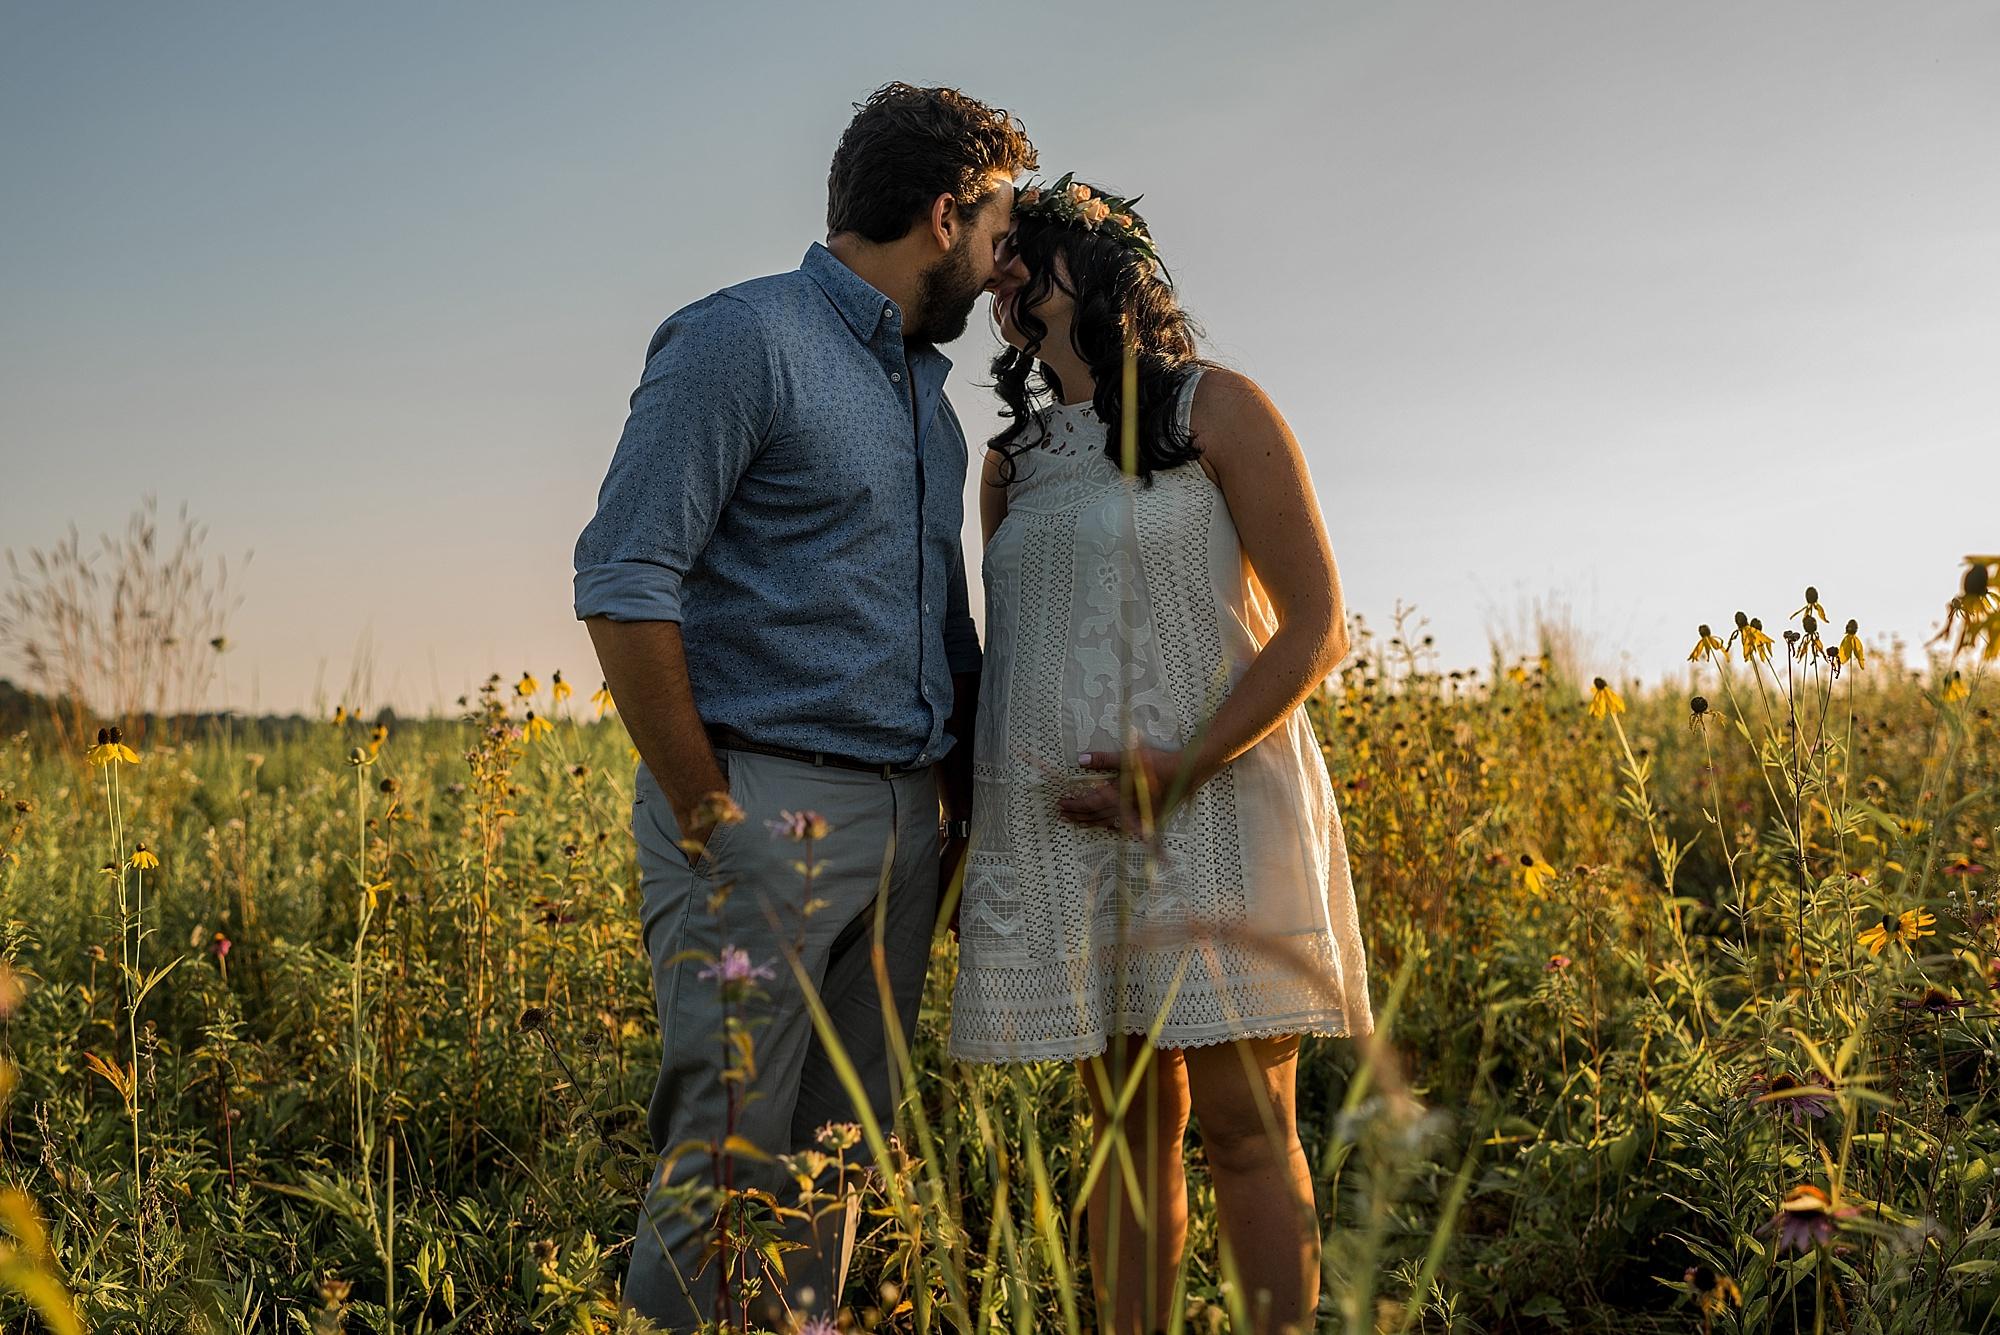 lauren-grayson-photography-cleveland-ohio-photographer-maternity-summer-outdoor-bohemian-fields-session_0485.jpg